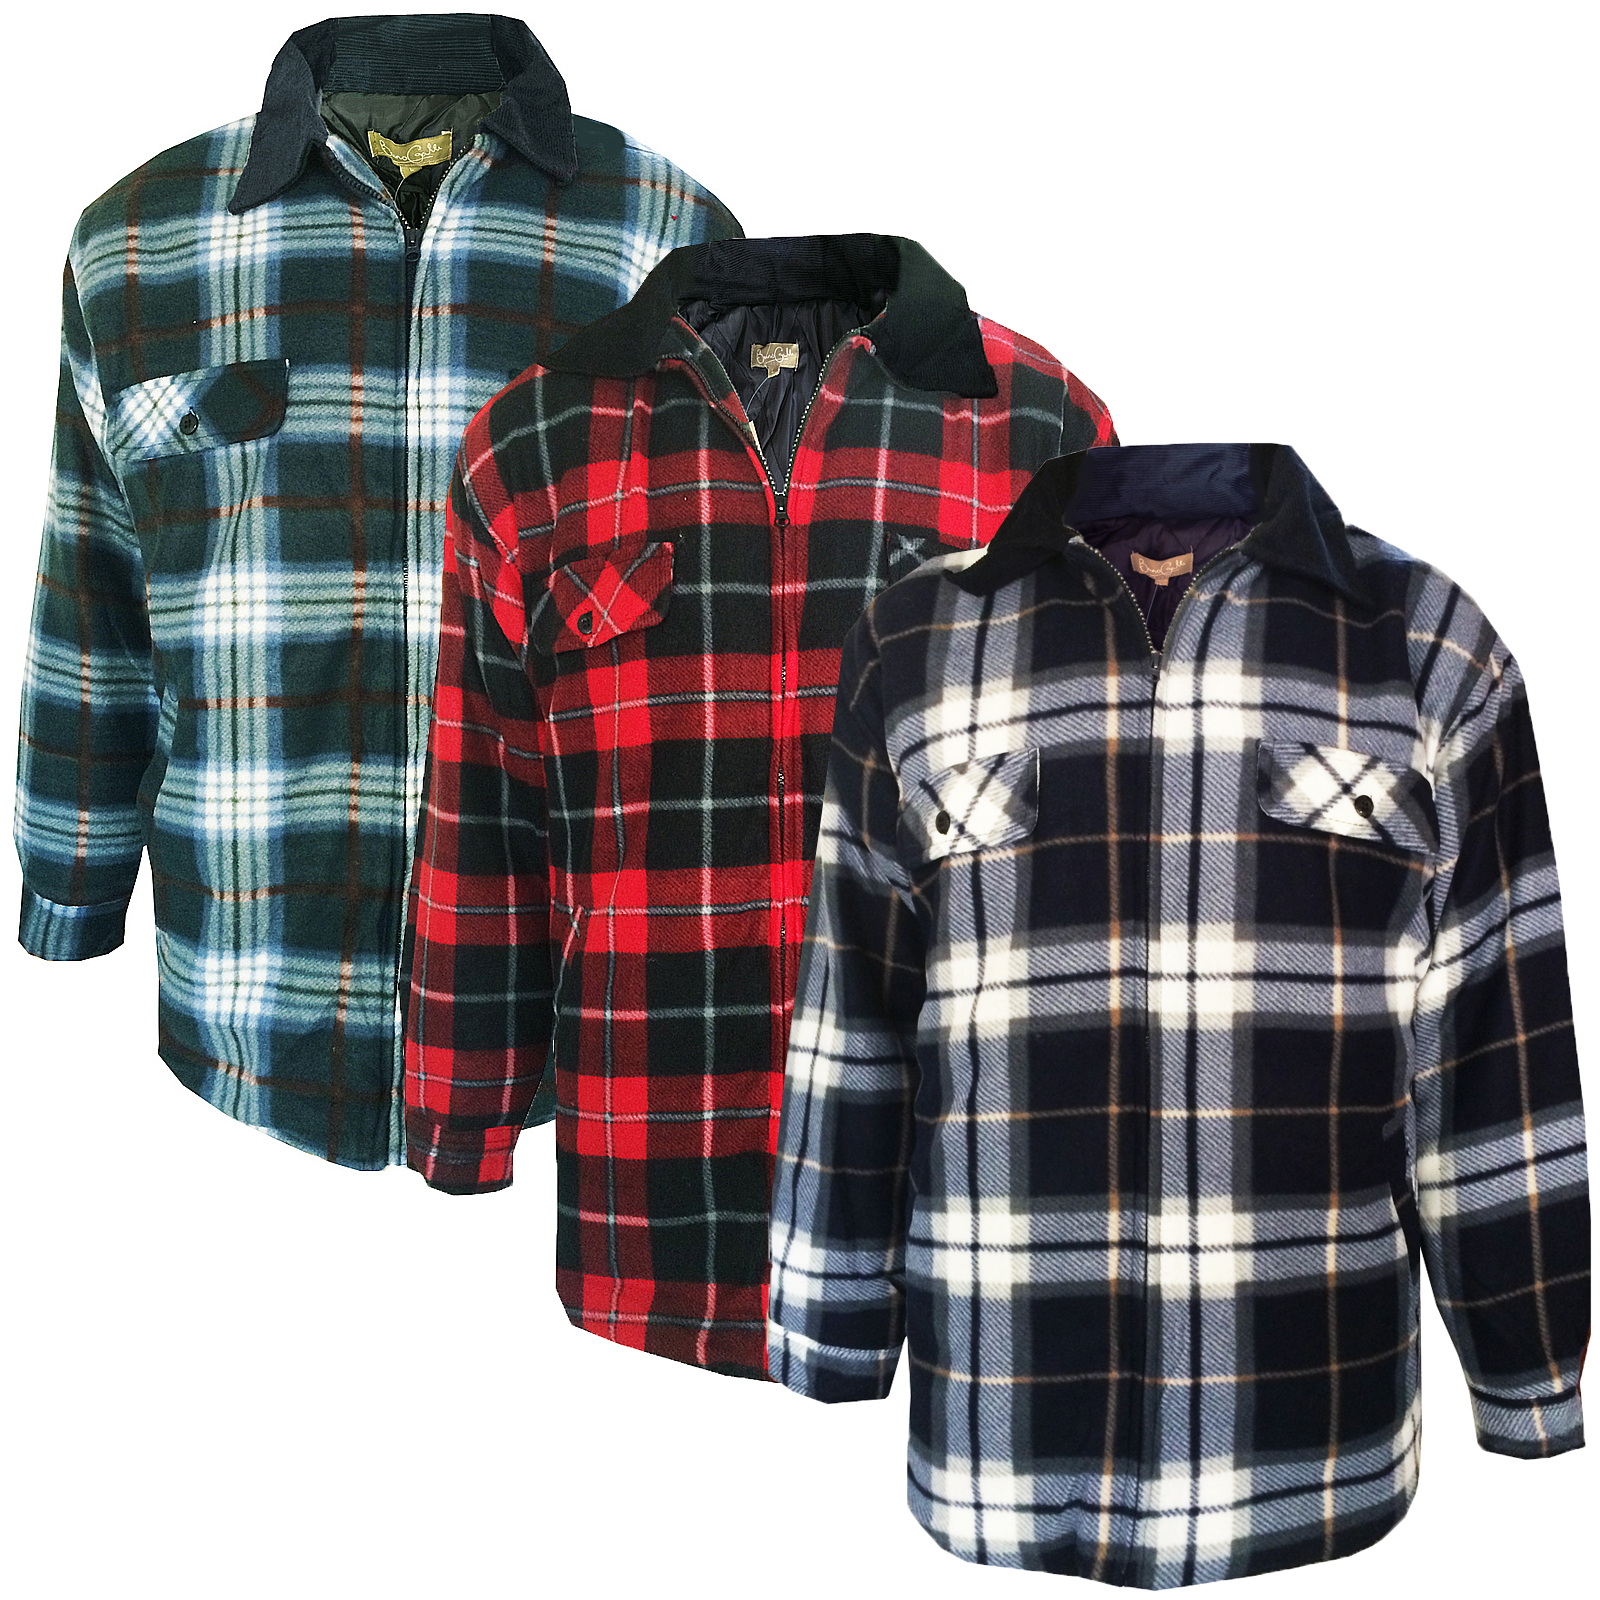 Shipping At Farfetch Dsquared2 Lumberjack Shirt Panel Jacket